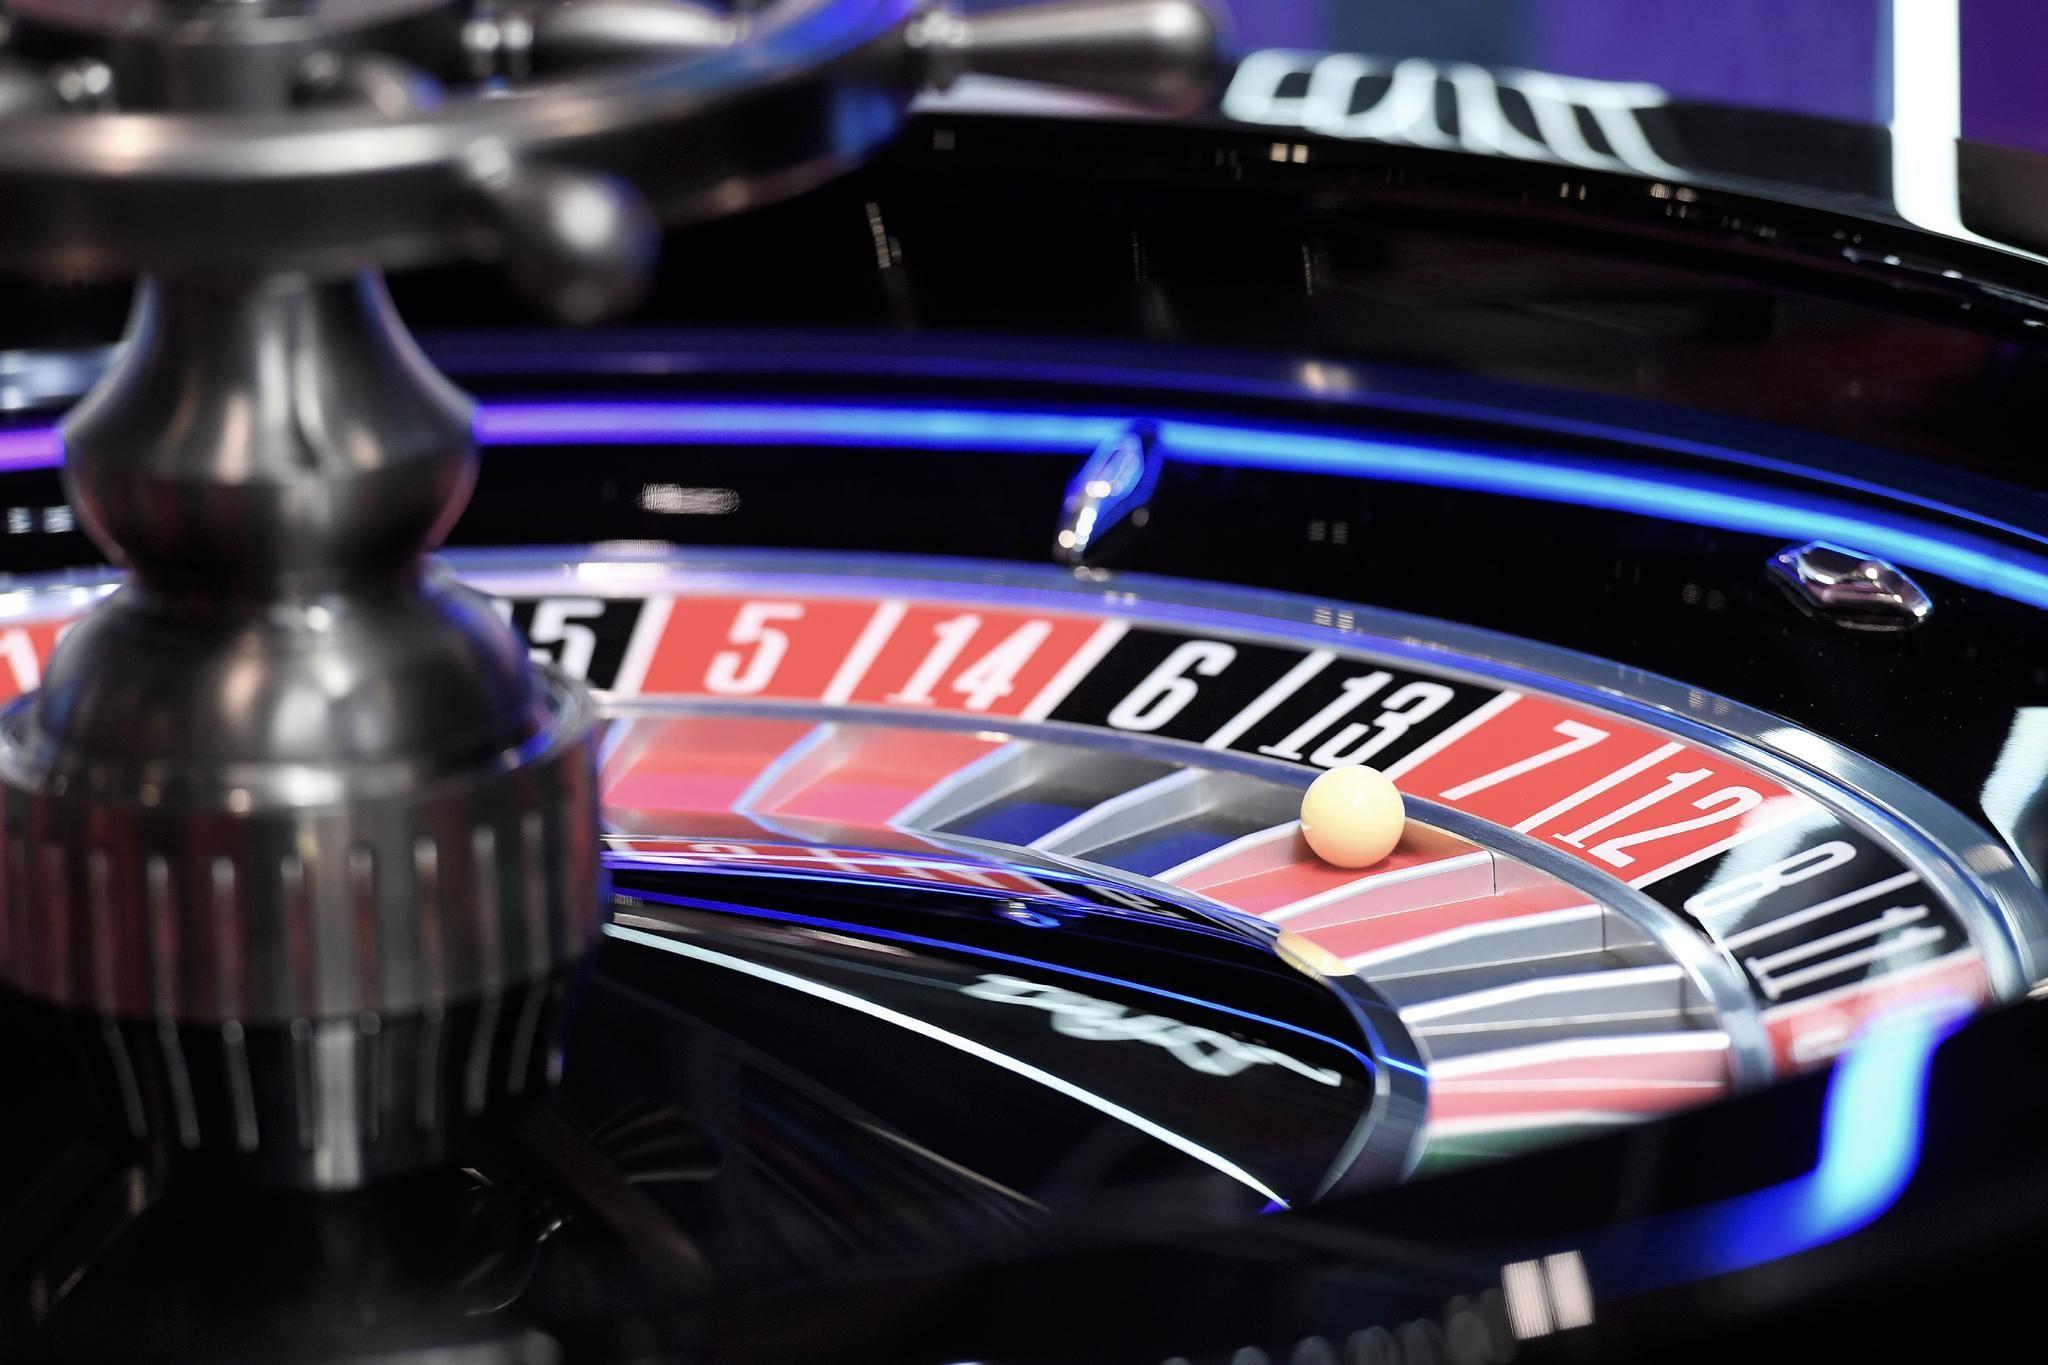 Consumer Protection and Responsible Gambling Zones